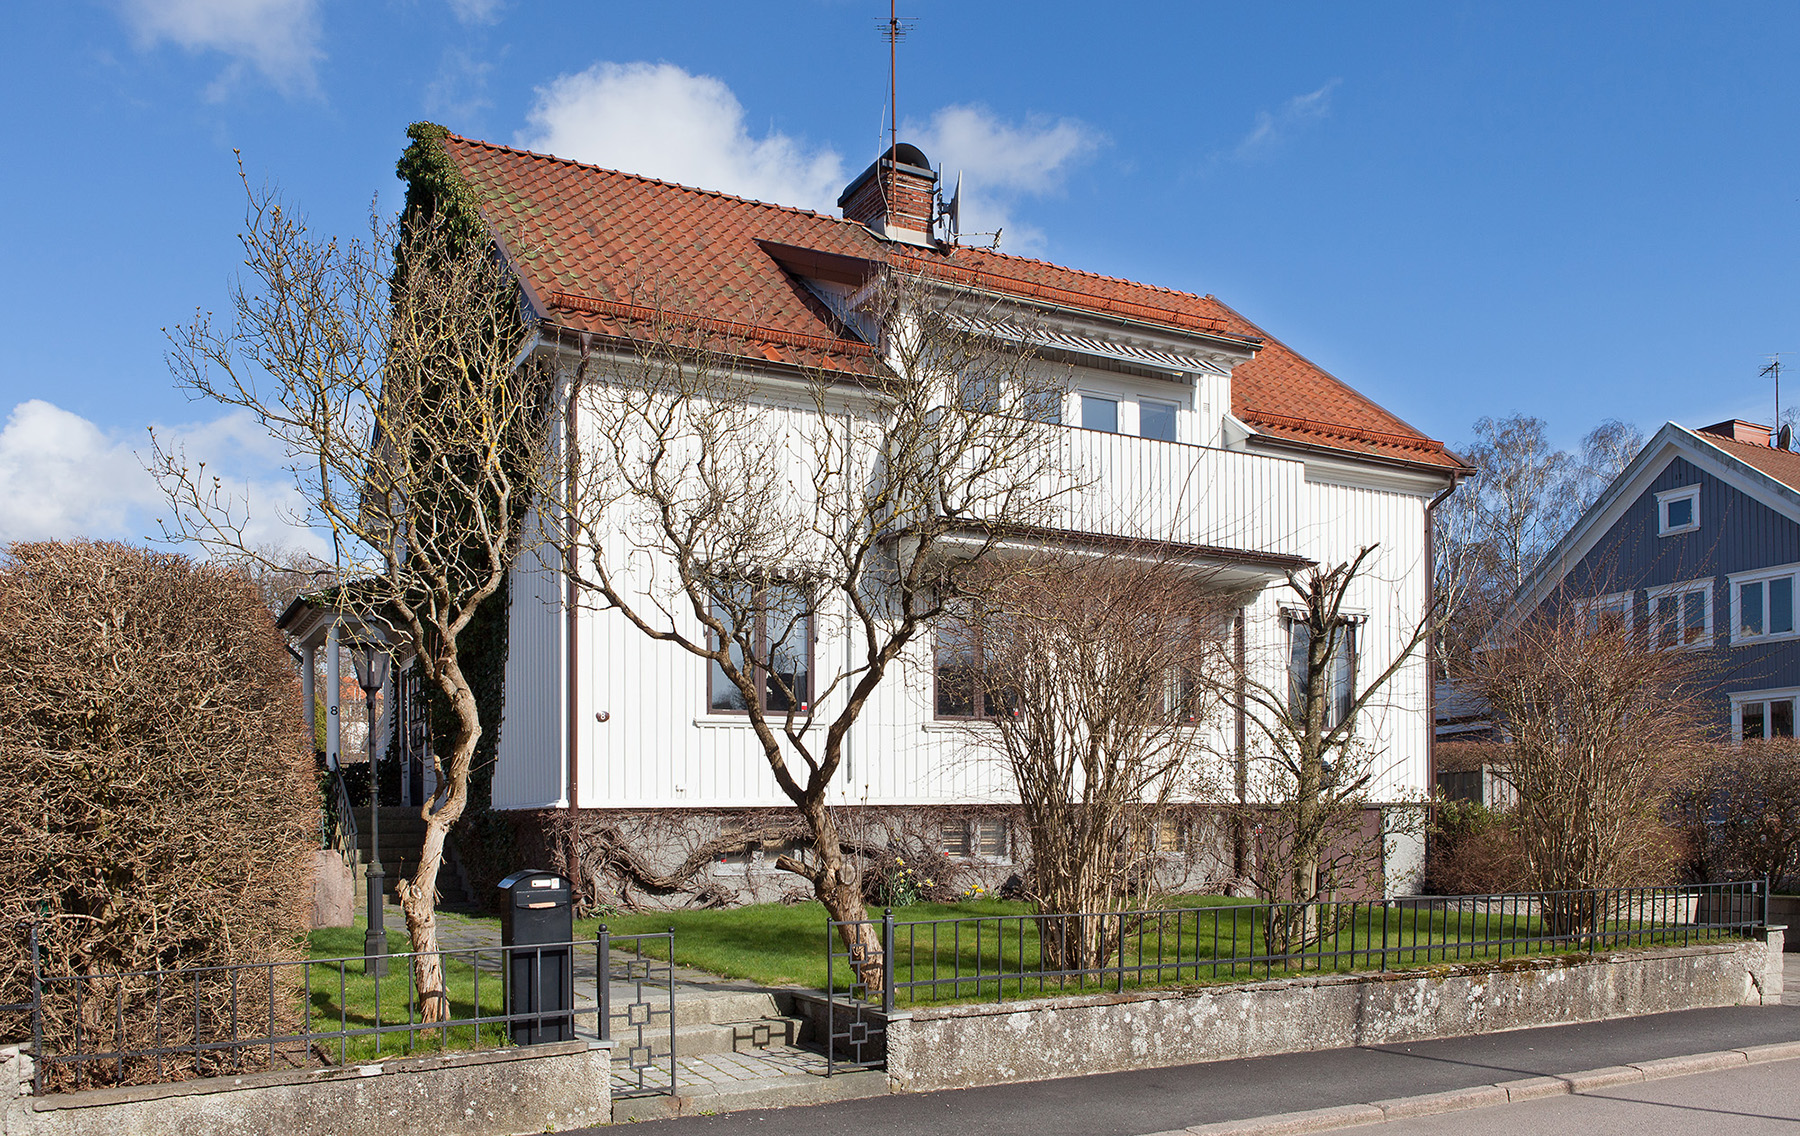 Single Family Home for Sale at Spacious home in Örgryte Humlegårdsgatan 8 Gothenburg, Vastra Gotaland, 41274 Sweden